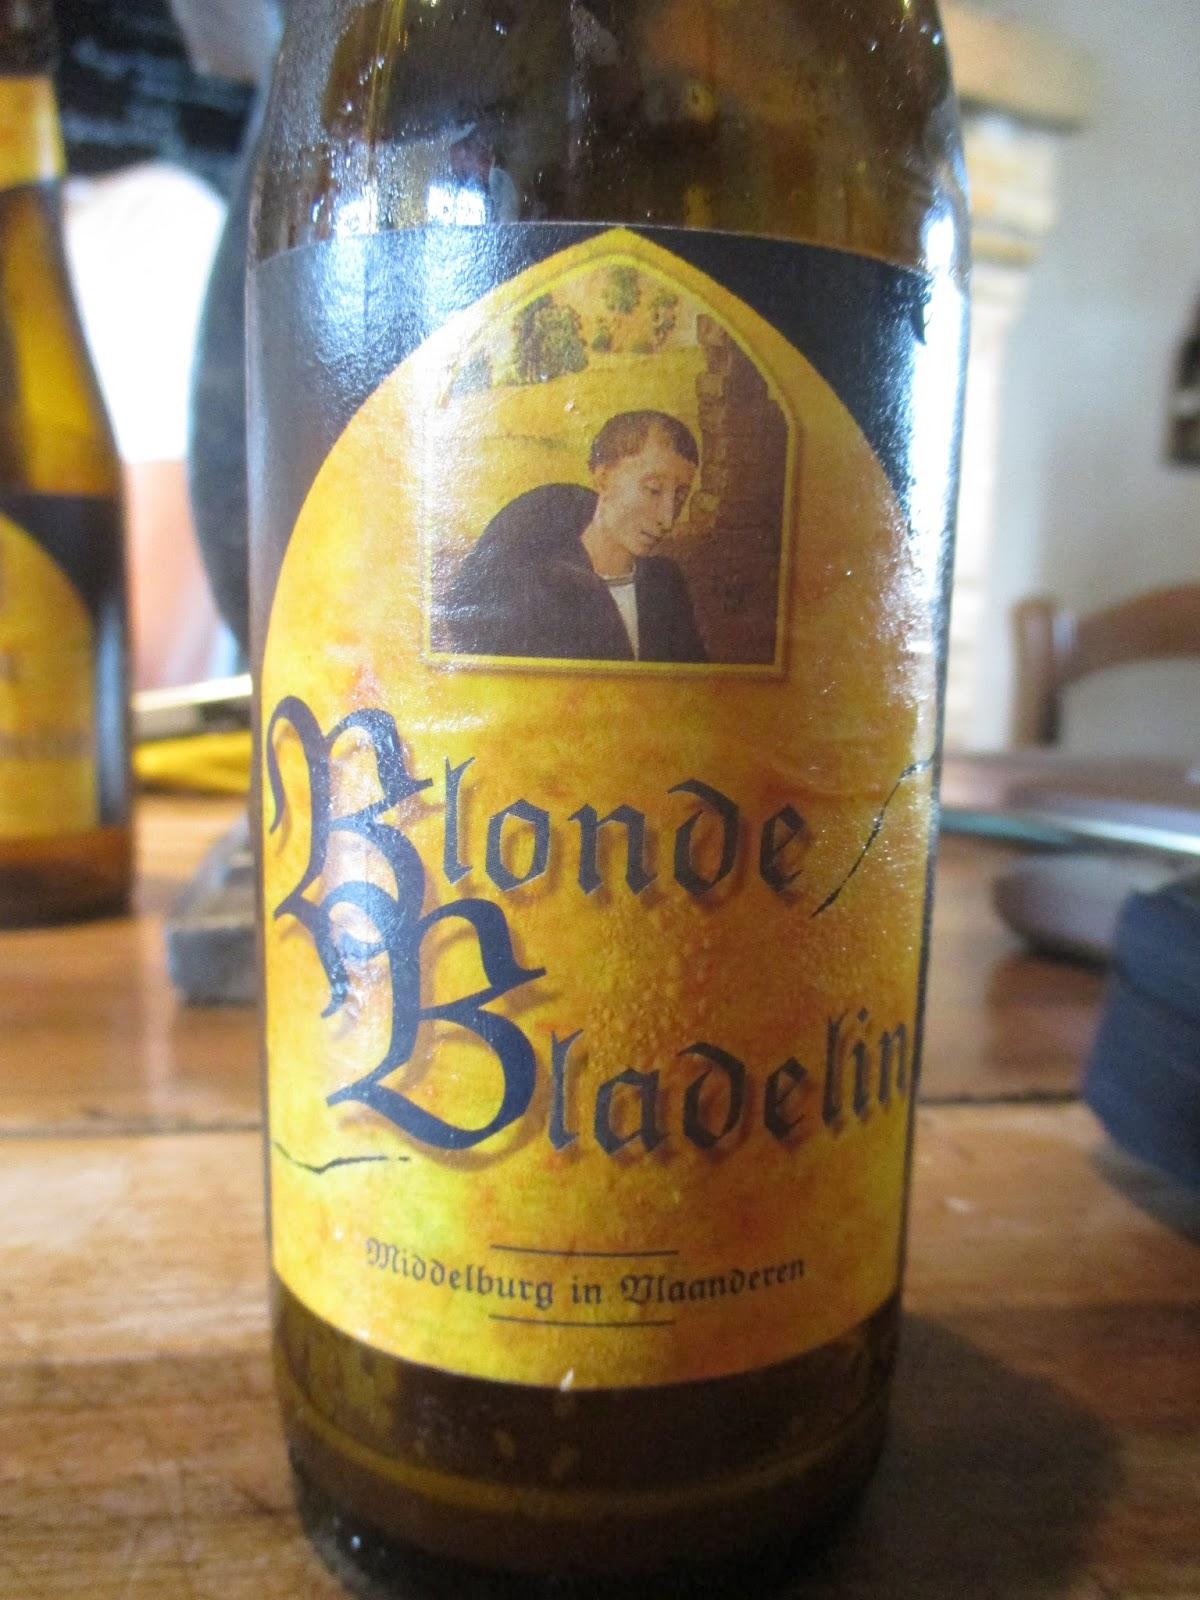 Blonde Bladelin